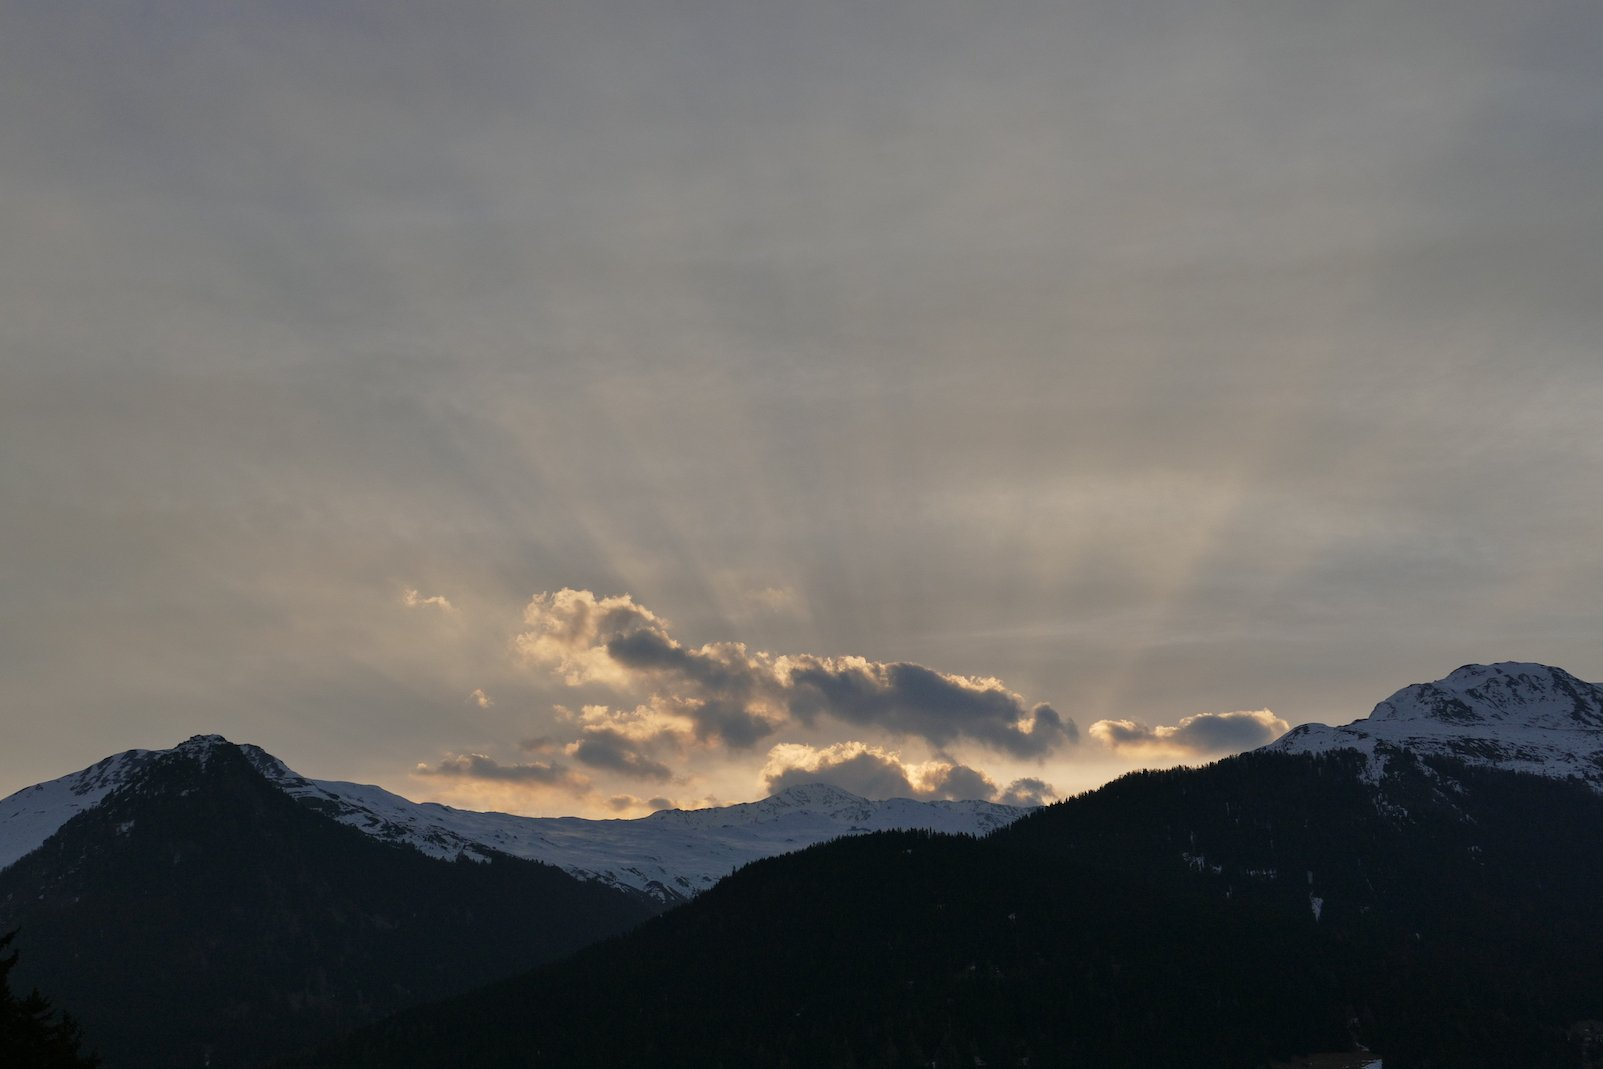 Sonnenaufgang in Davos